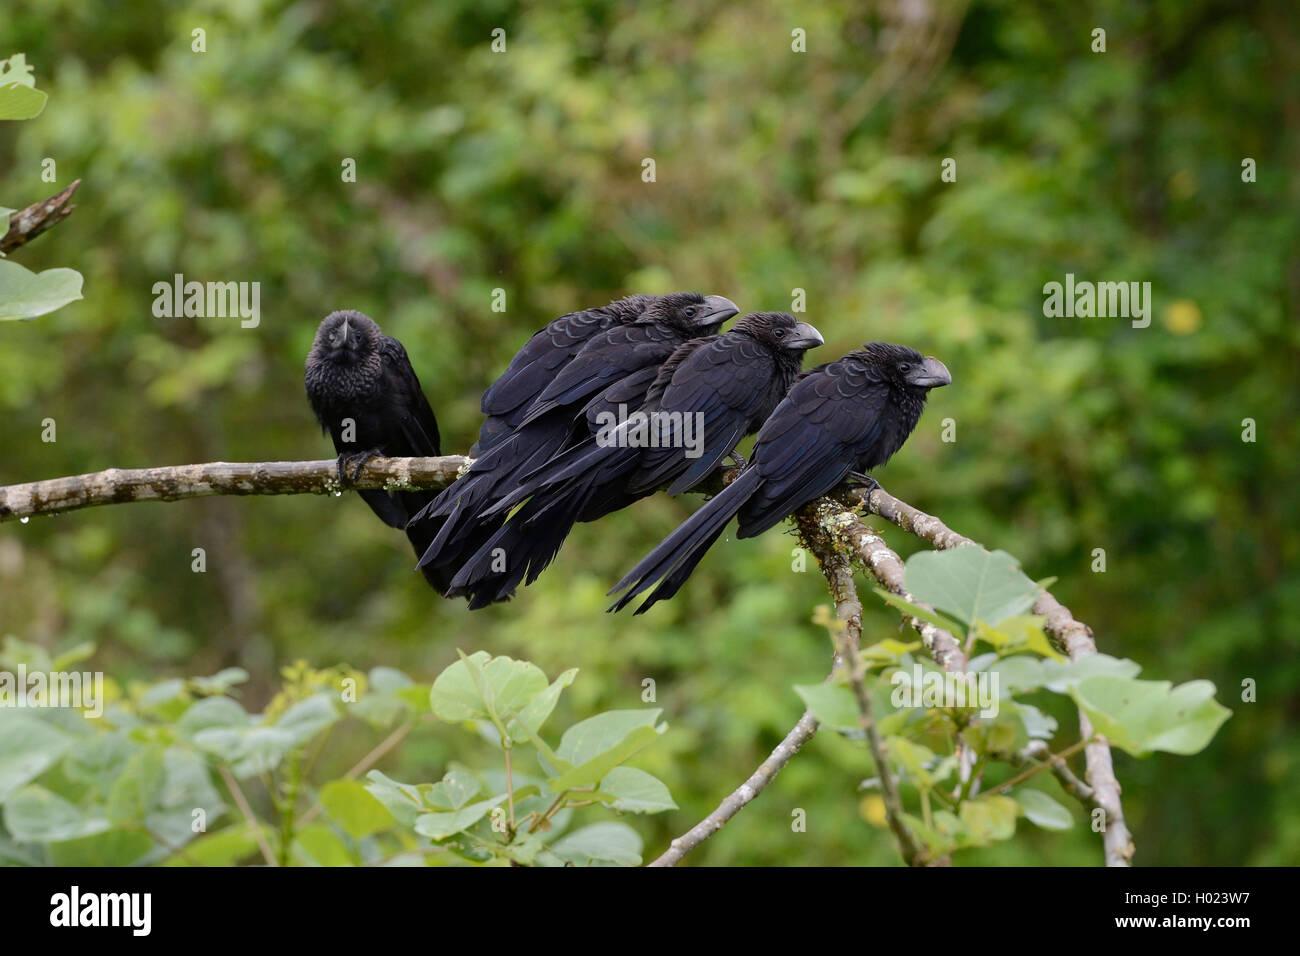 Glattschnabelani, Glattschnabel-Ani, Ani (Crotophaga ani), Gruppe sitzt auf einem Ast, Ecuador, Galapagos-Inseln, - Stock Image